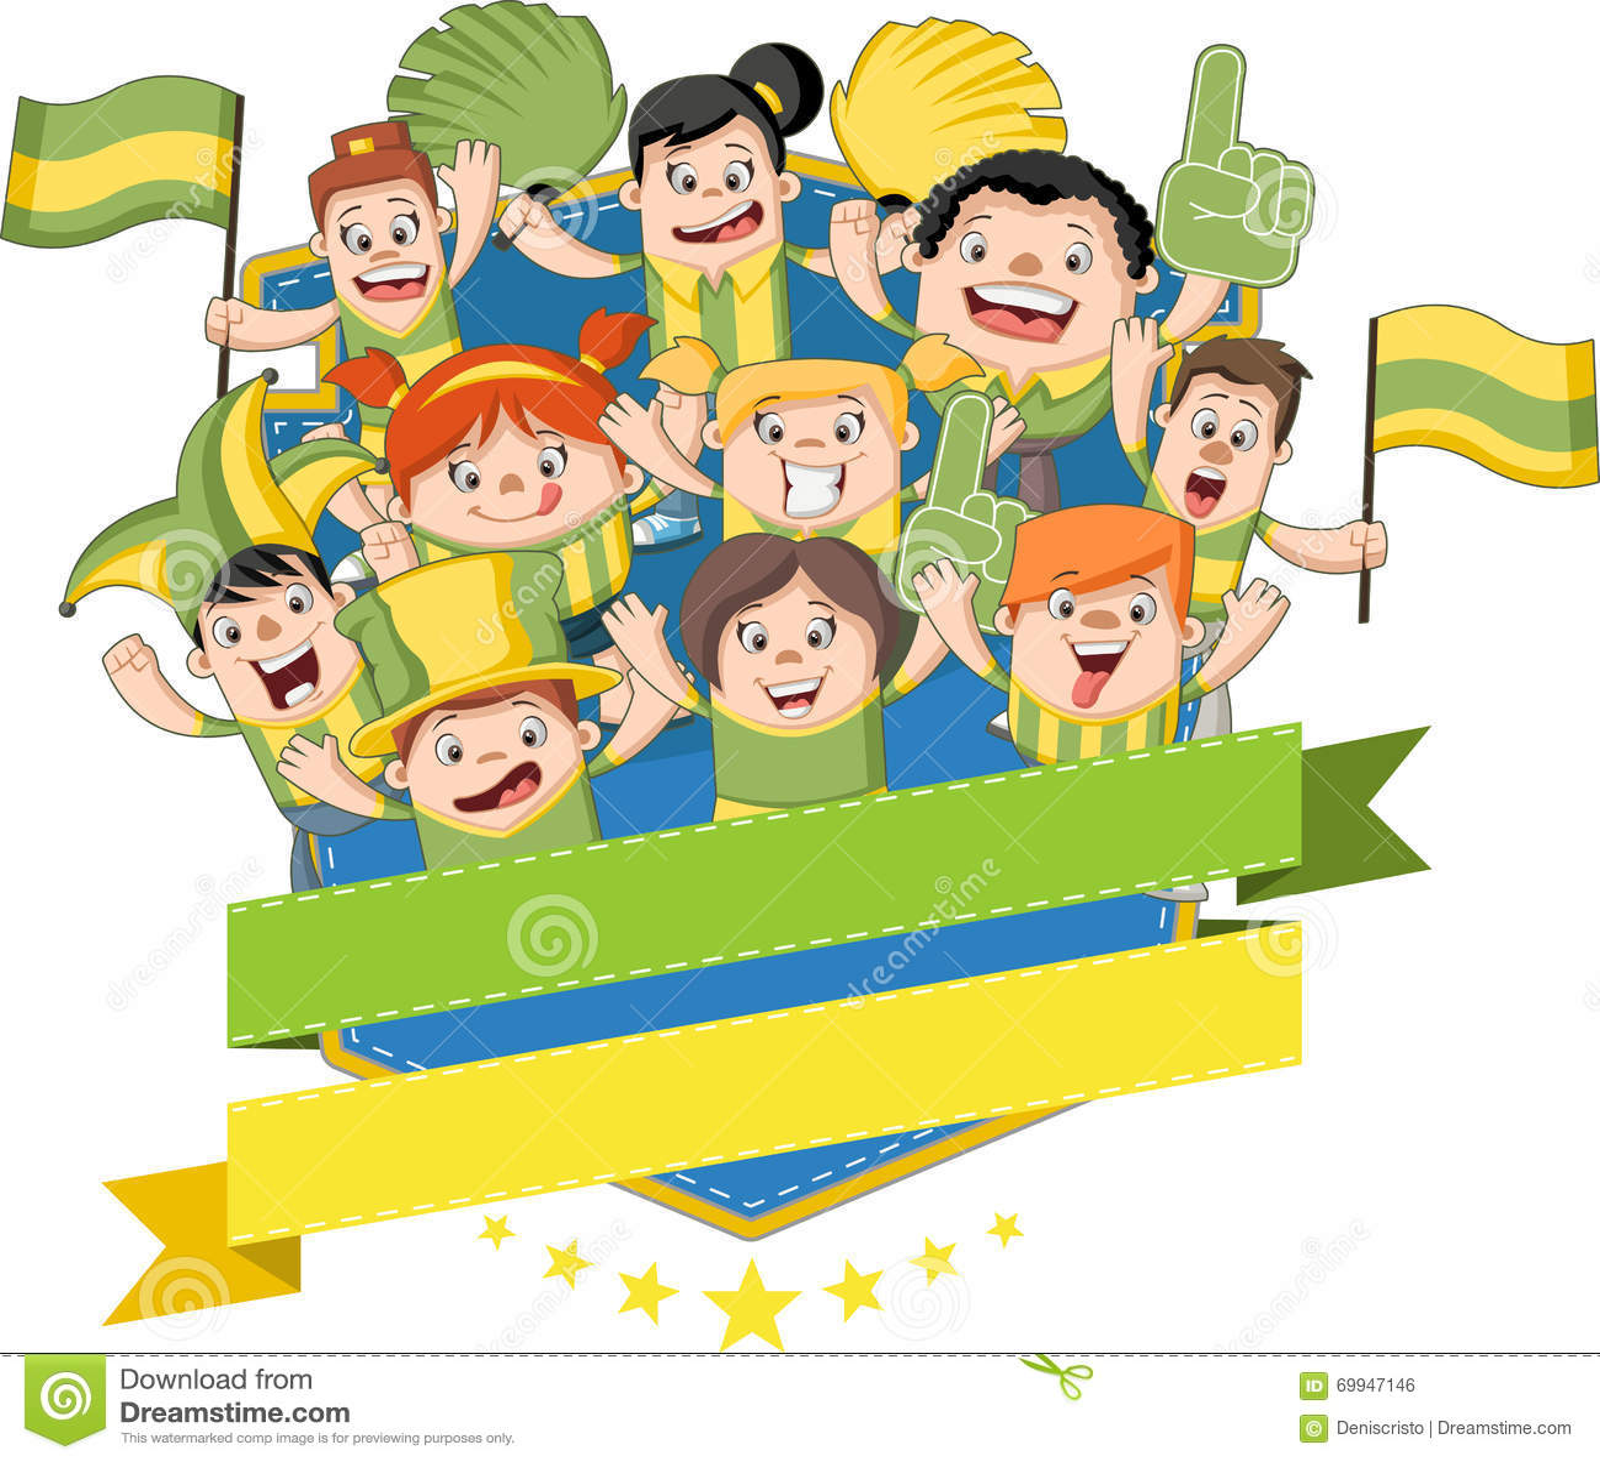 Cheering Fans Cartoon : Group of cartoon sport fans stock vector image